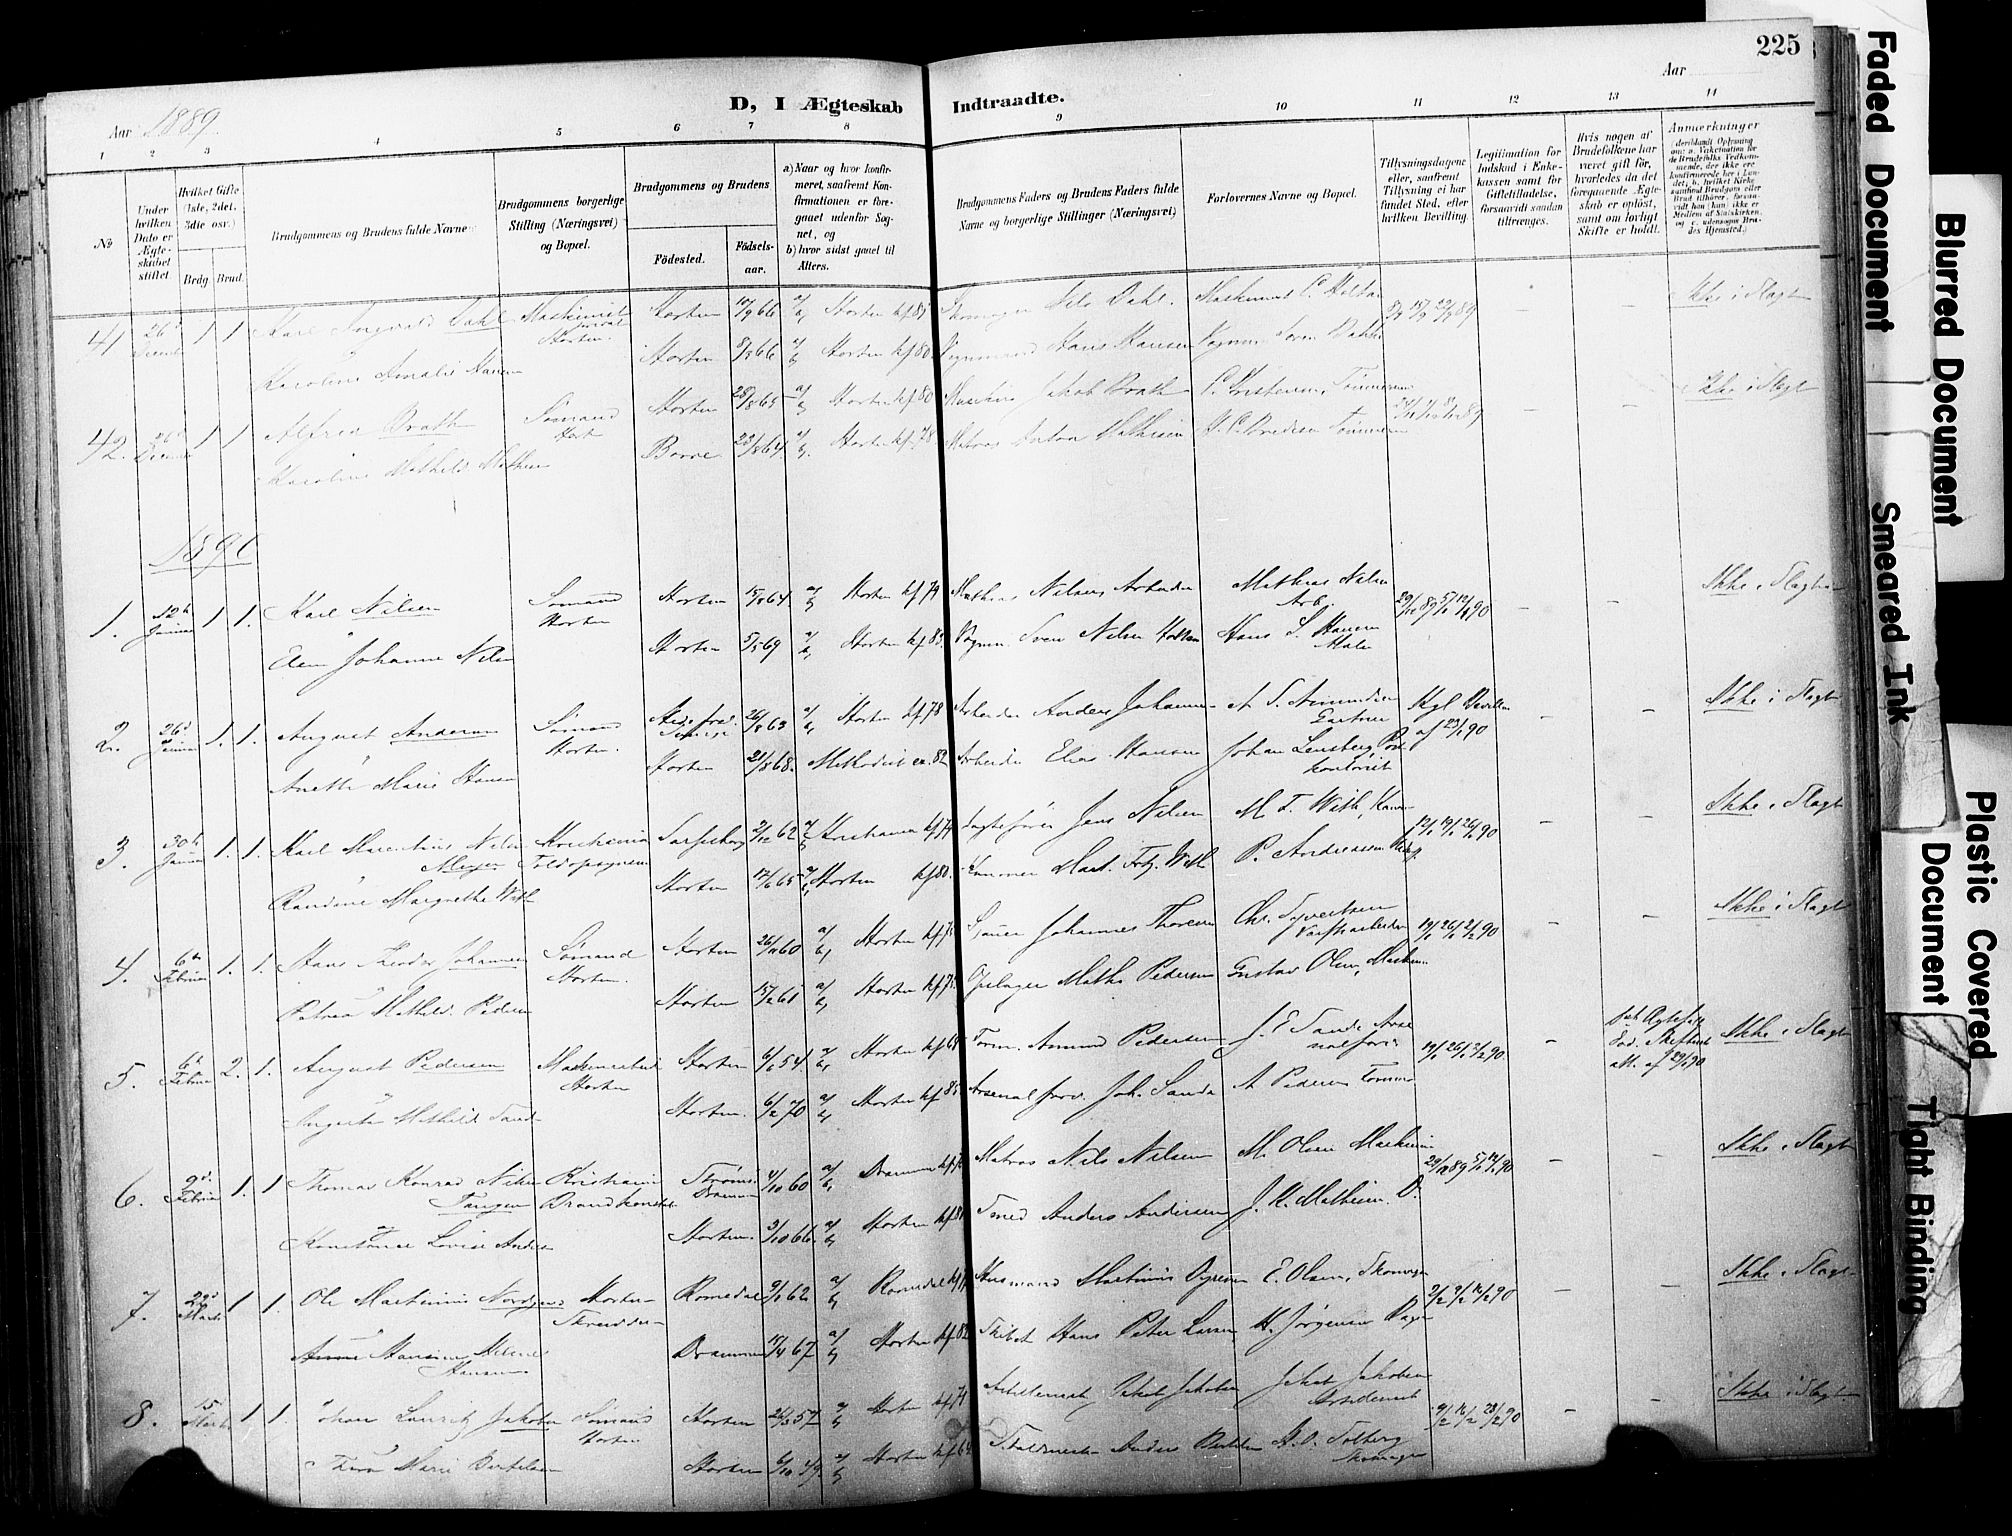 SAKO, Horten kirkebøker, F/Fa/L0004: Parish register (official) no. 4, 1888-1895, p. 225